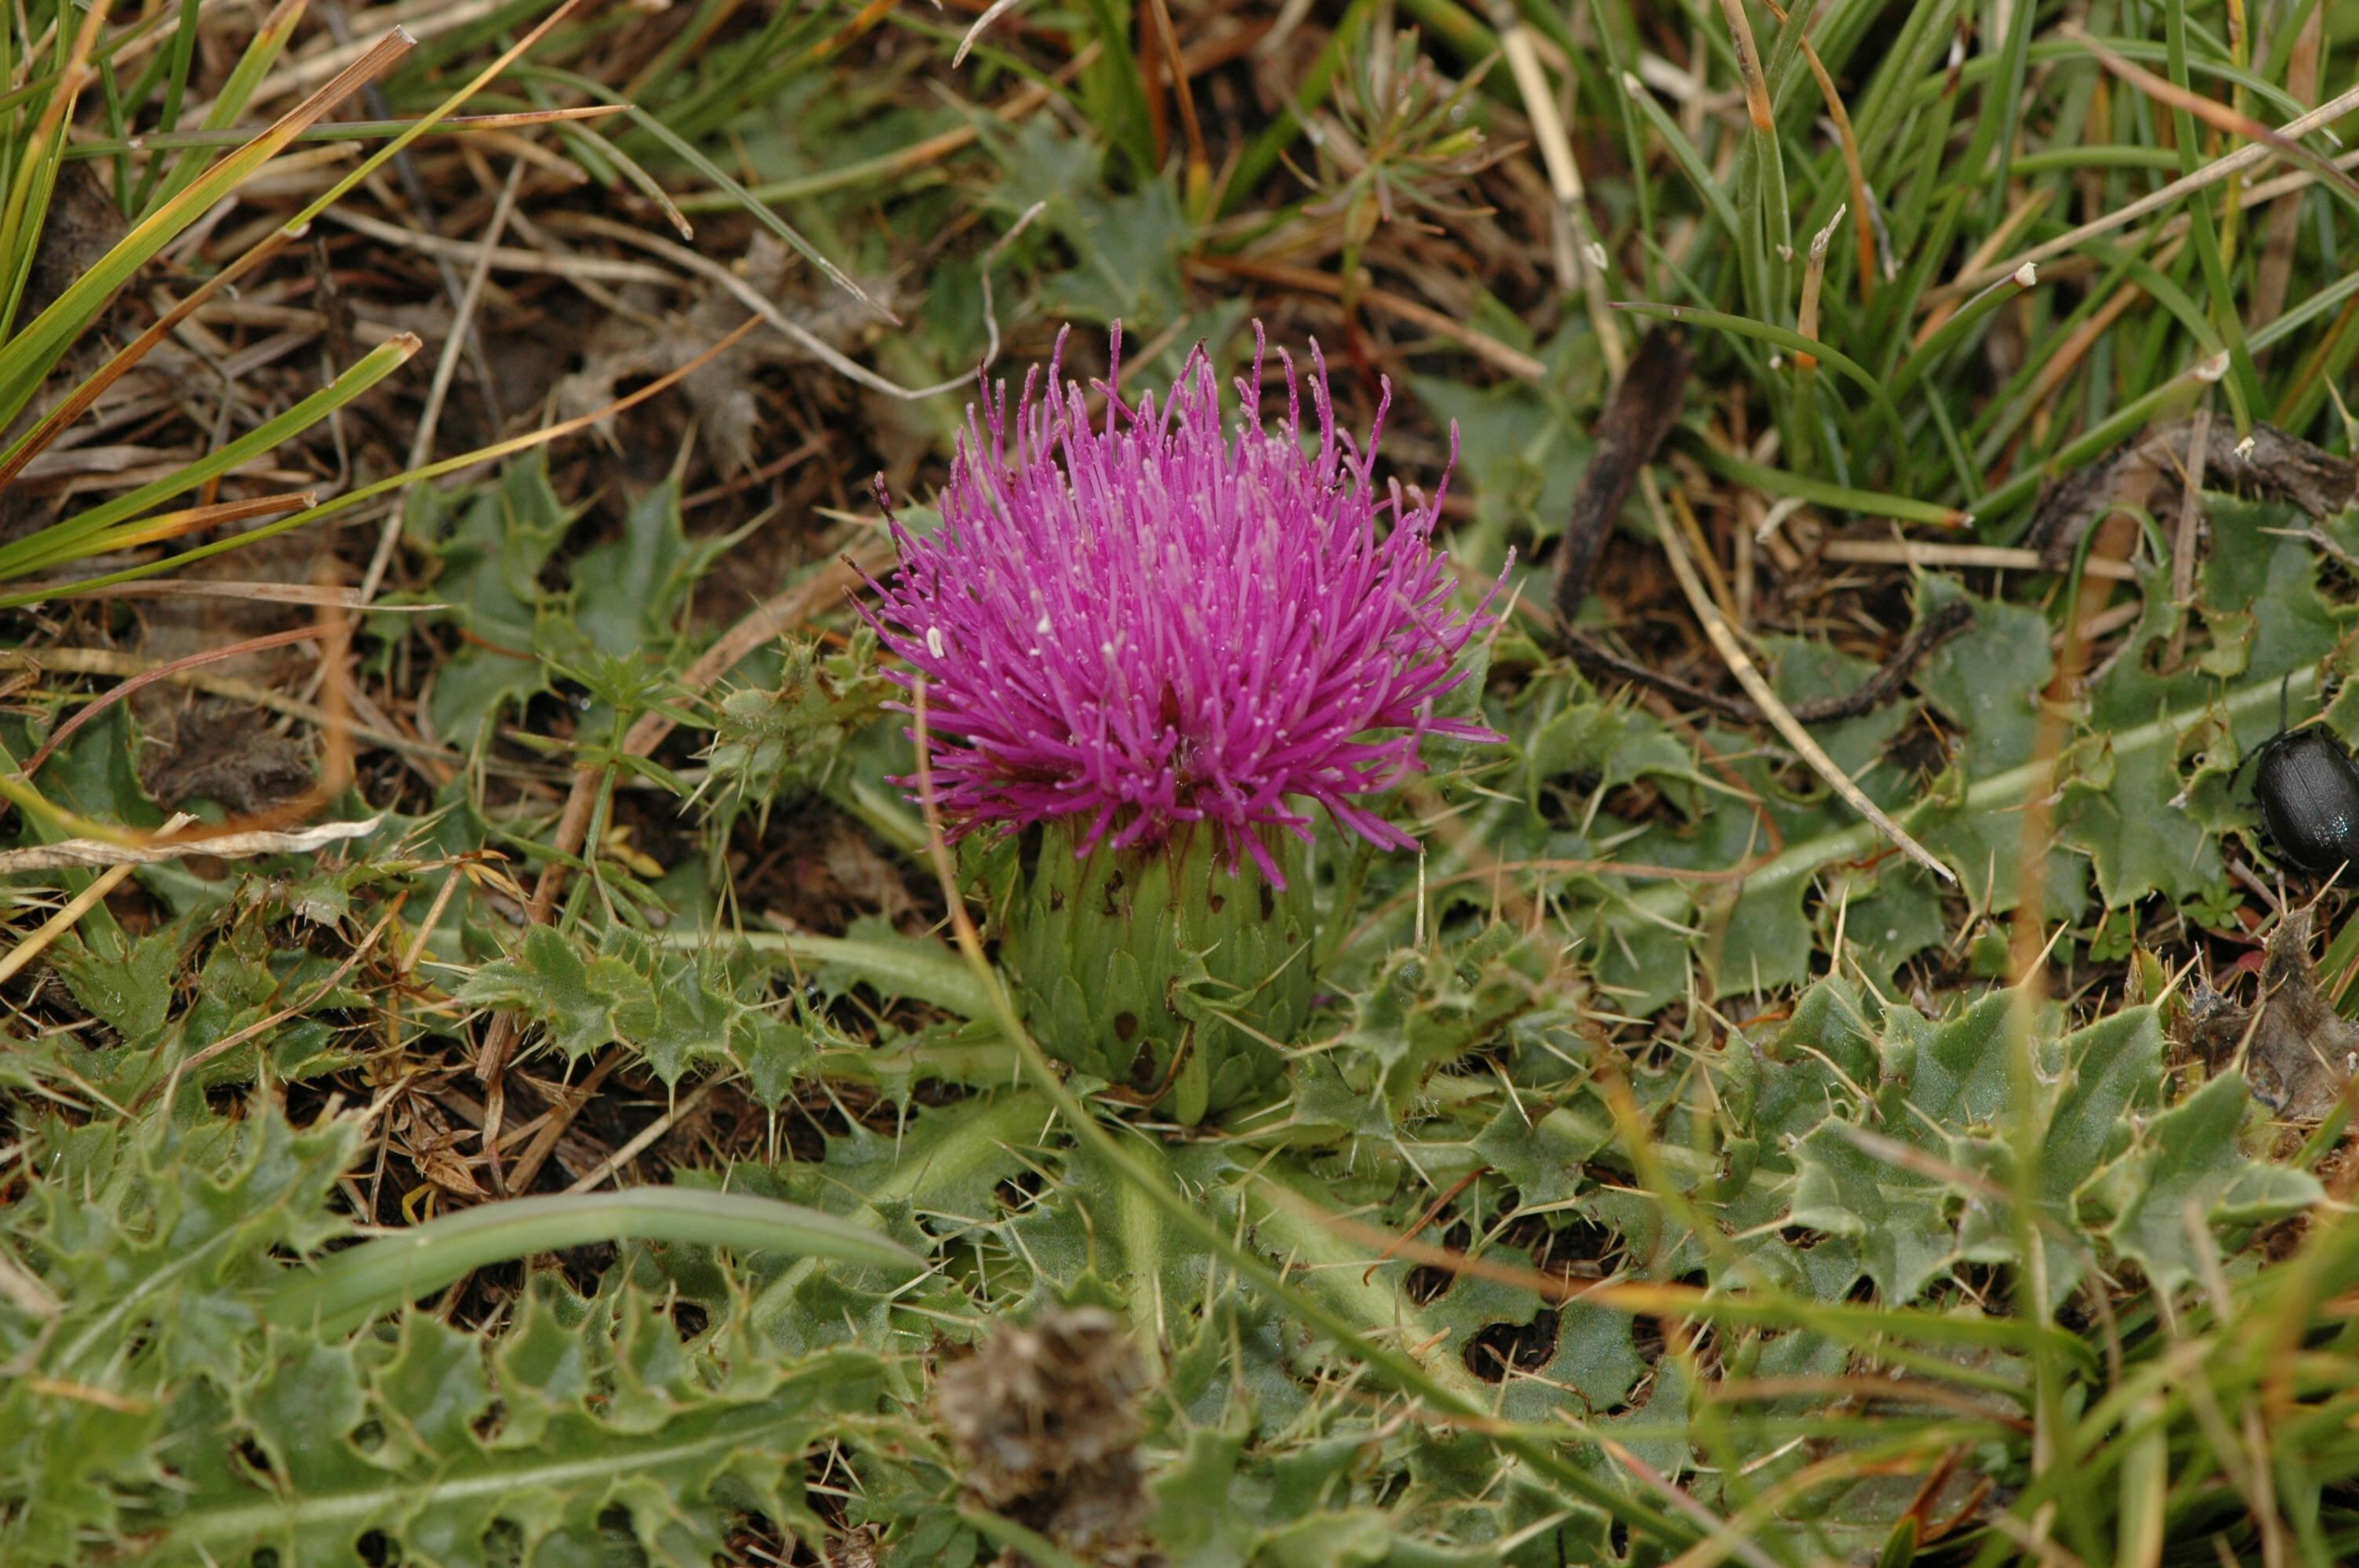 http://api.tela-botanica.org/img:000220356O.jpg